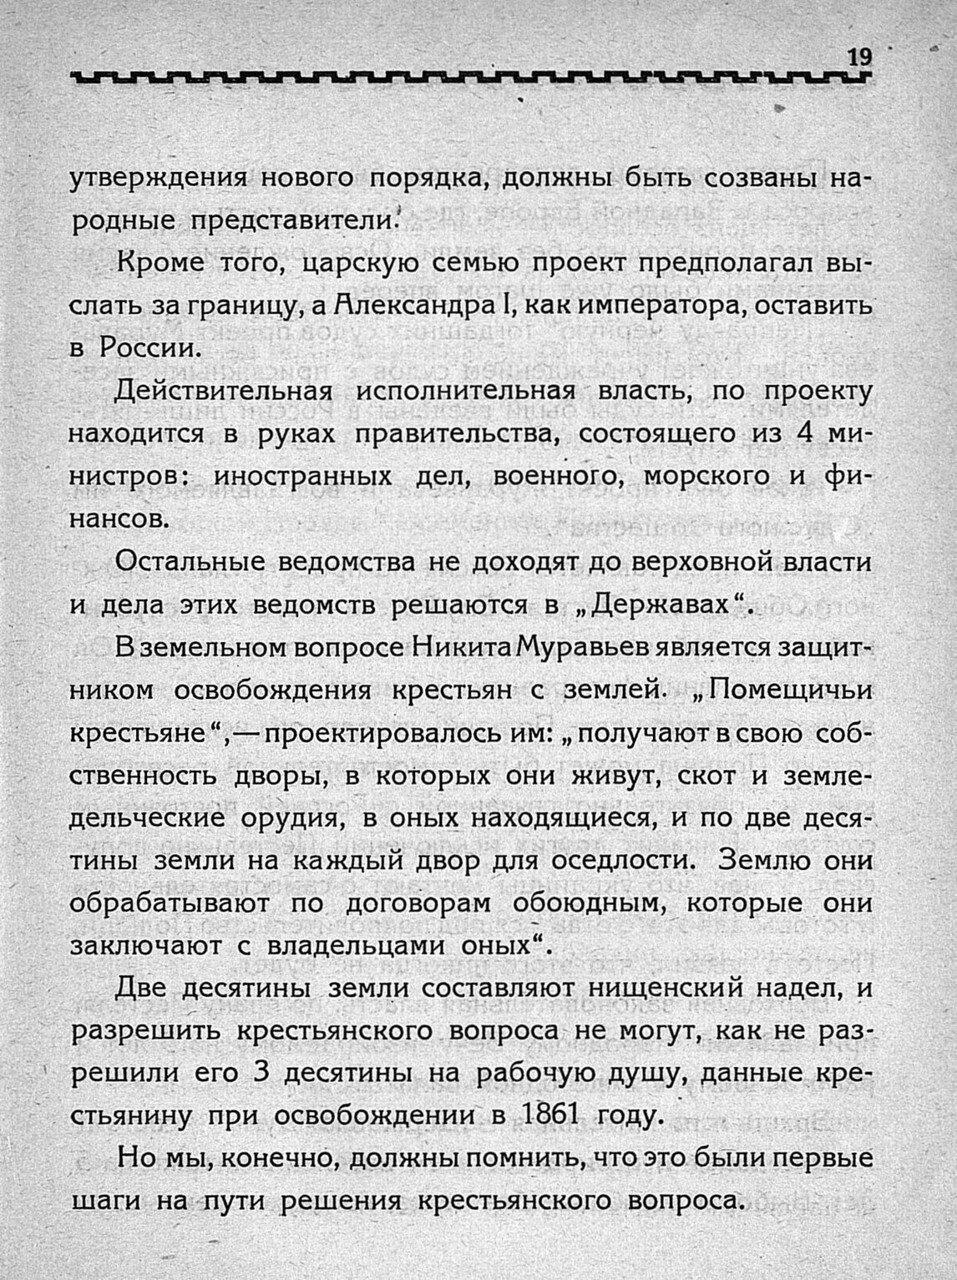 https://img-fotki.yandex.ru/get/117896/199368979.23/0_1bfad7_b24d4cf4_XXXL.jpg